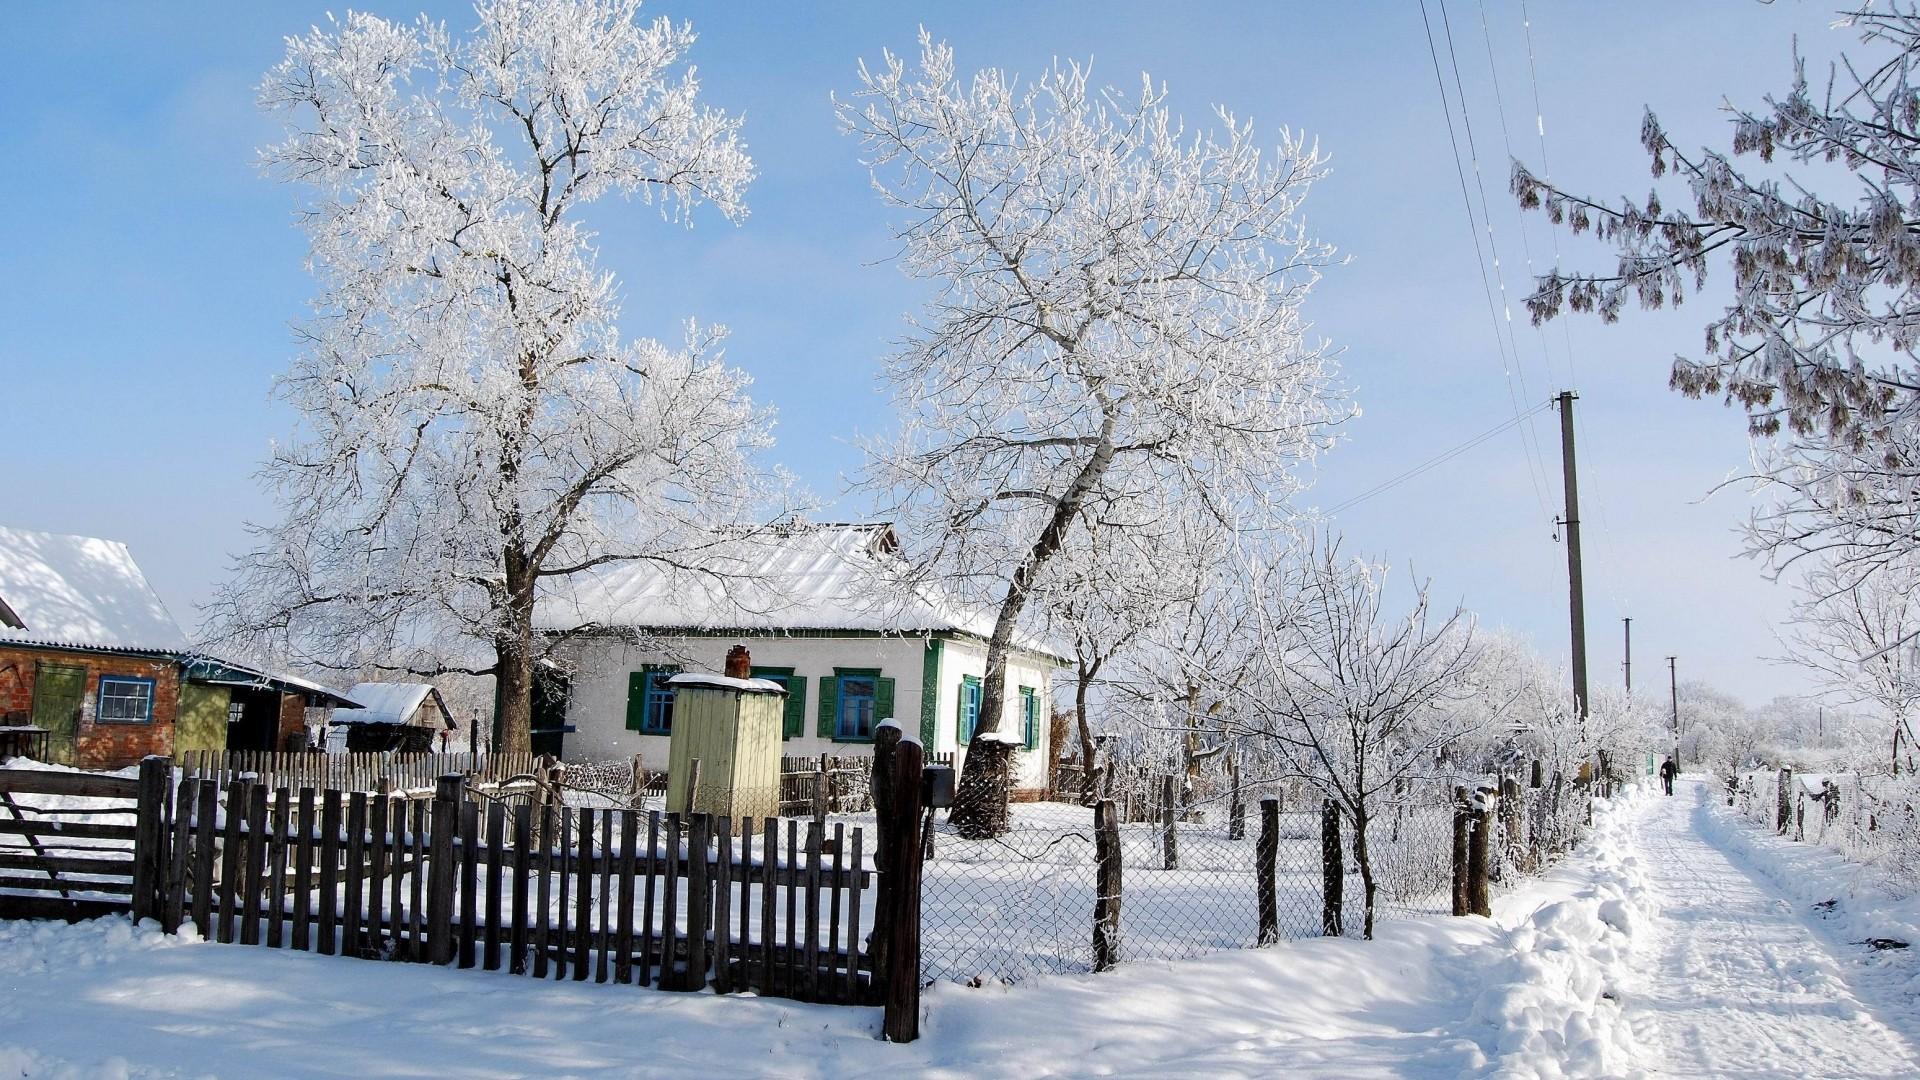 Wallpaper winter, snow, house, fence, village